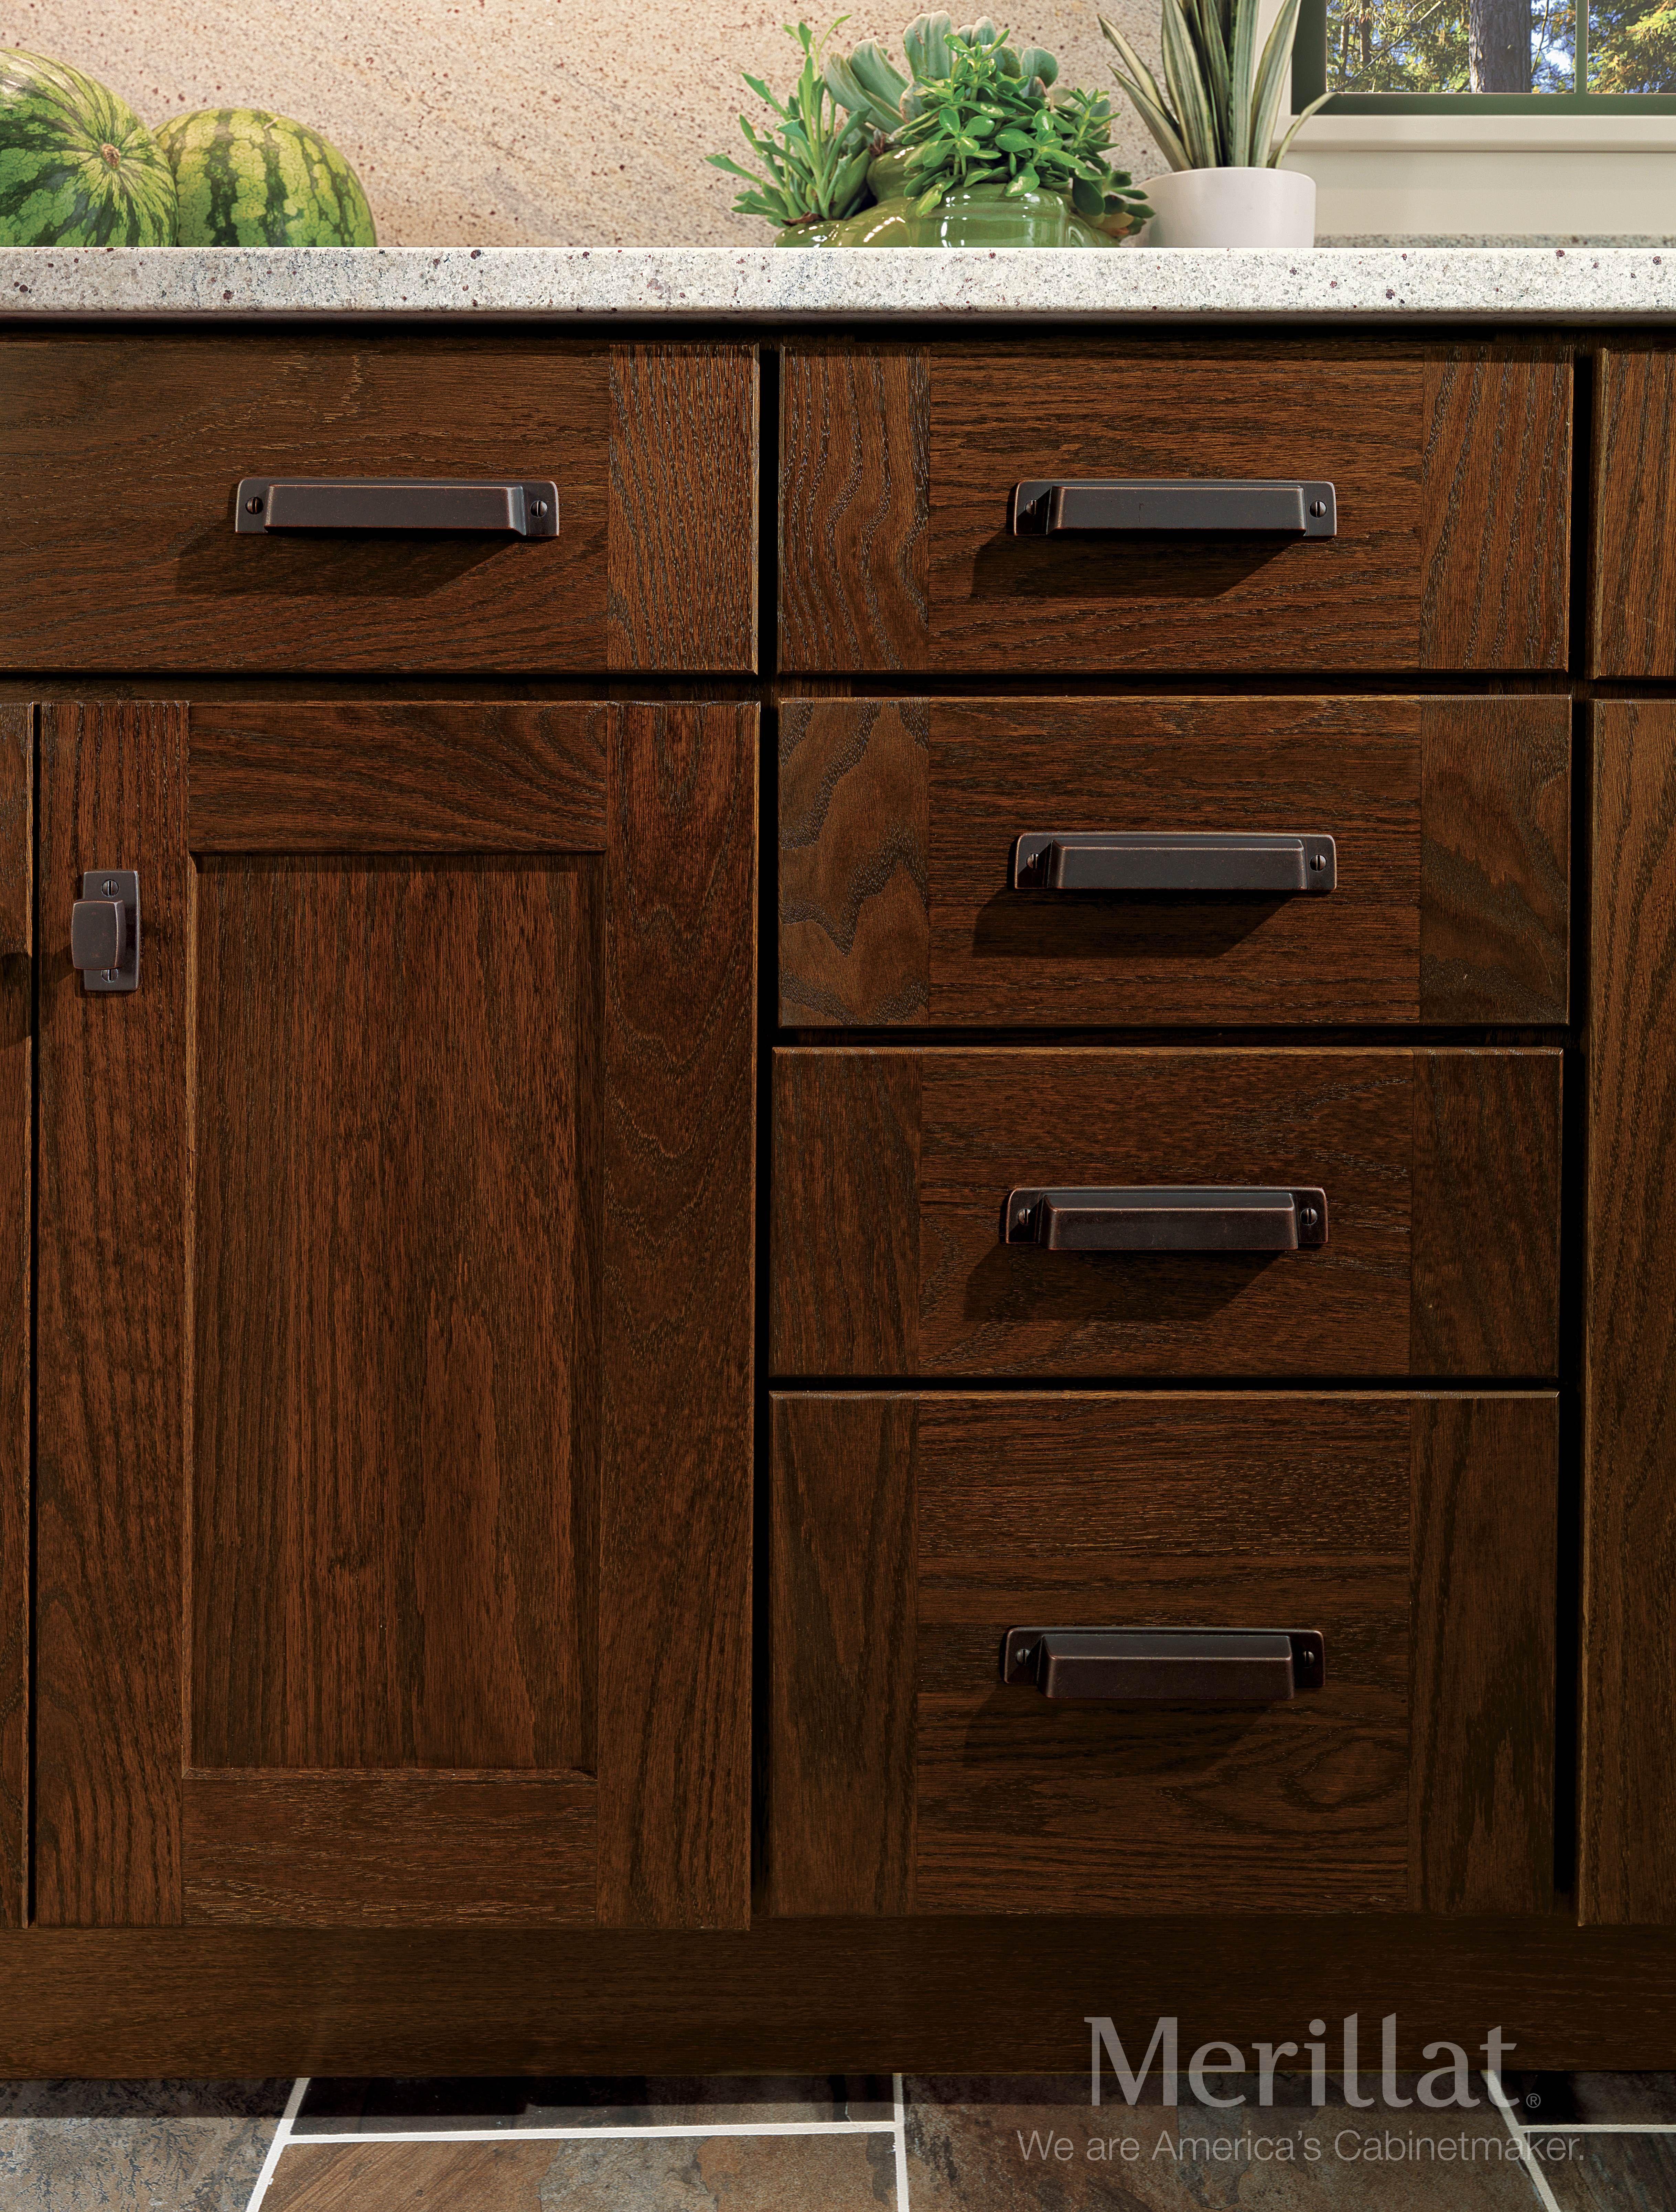 Merillat Clic Tolani Oak Pecan Cabinetry S Wood Grain Comes Through